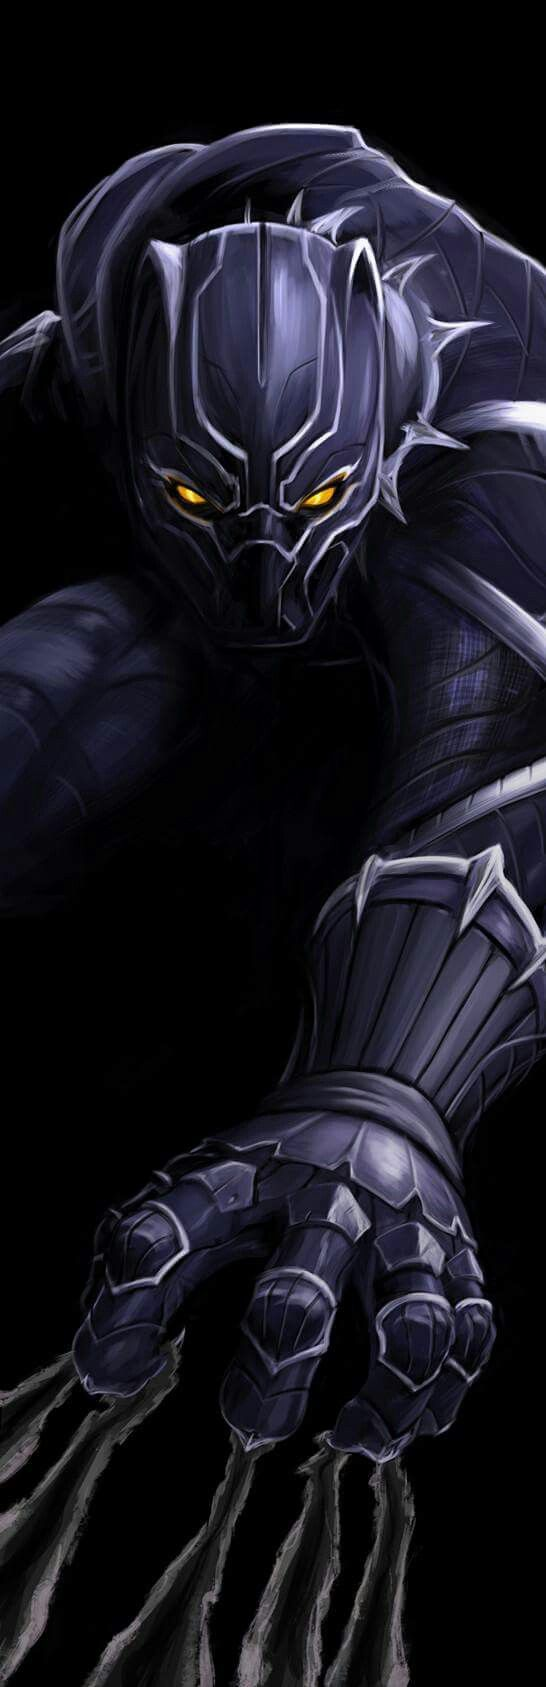 Pantera Negra - Universo Marvel                                                                                                                                                                                 Más